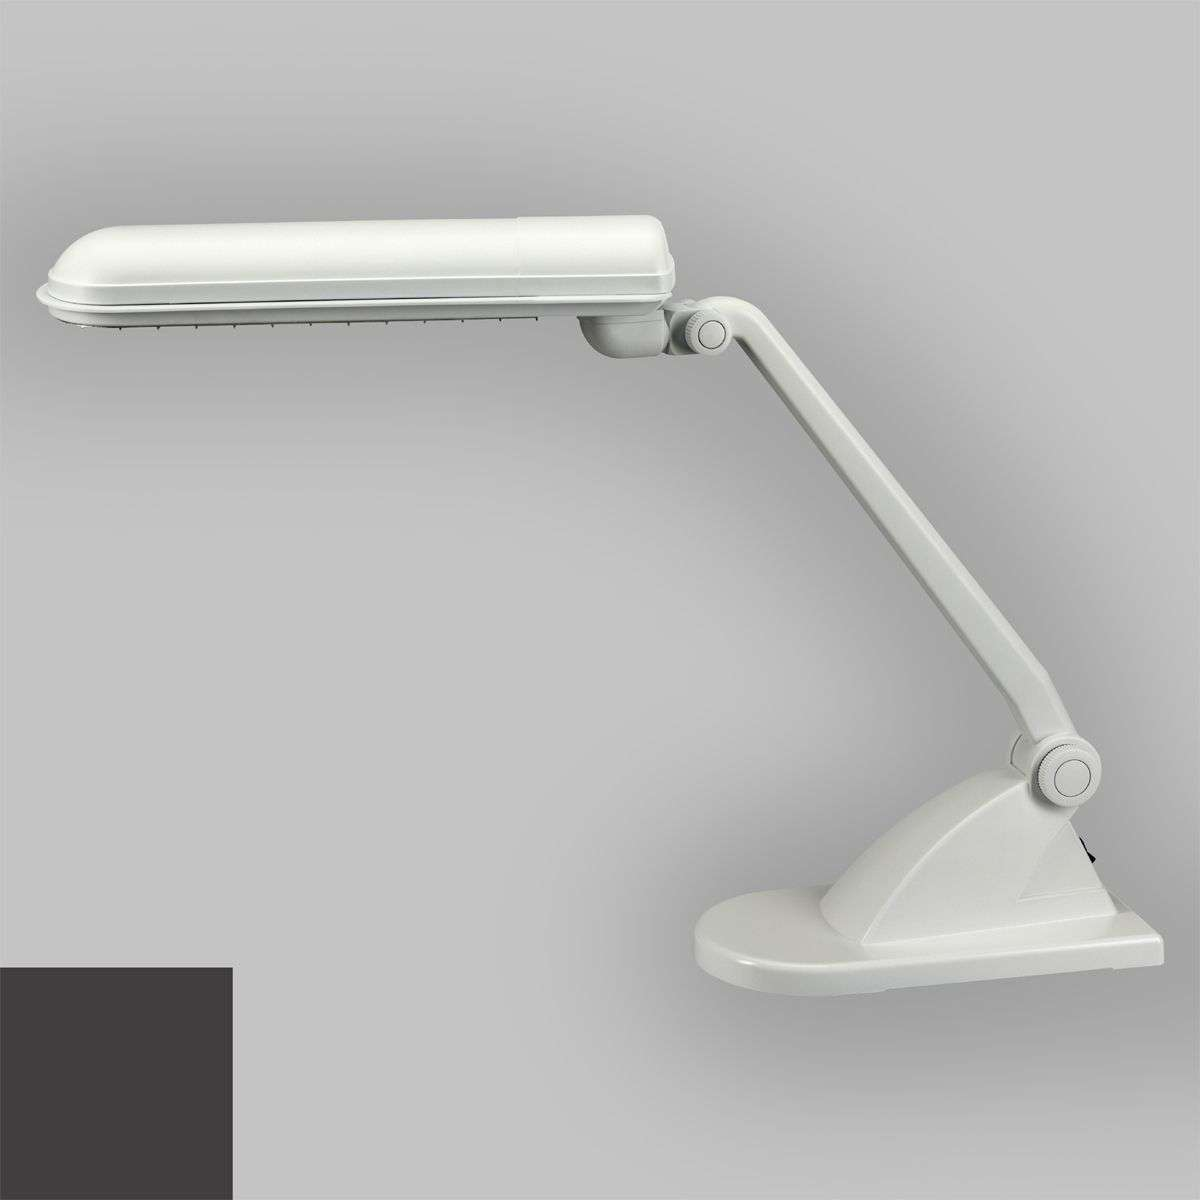 Glare free workplace light Orleander-1003101X-31